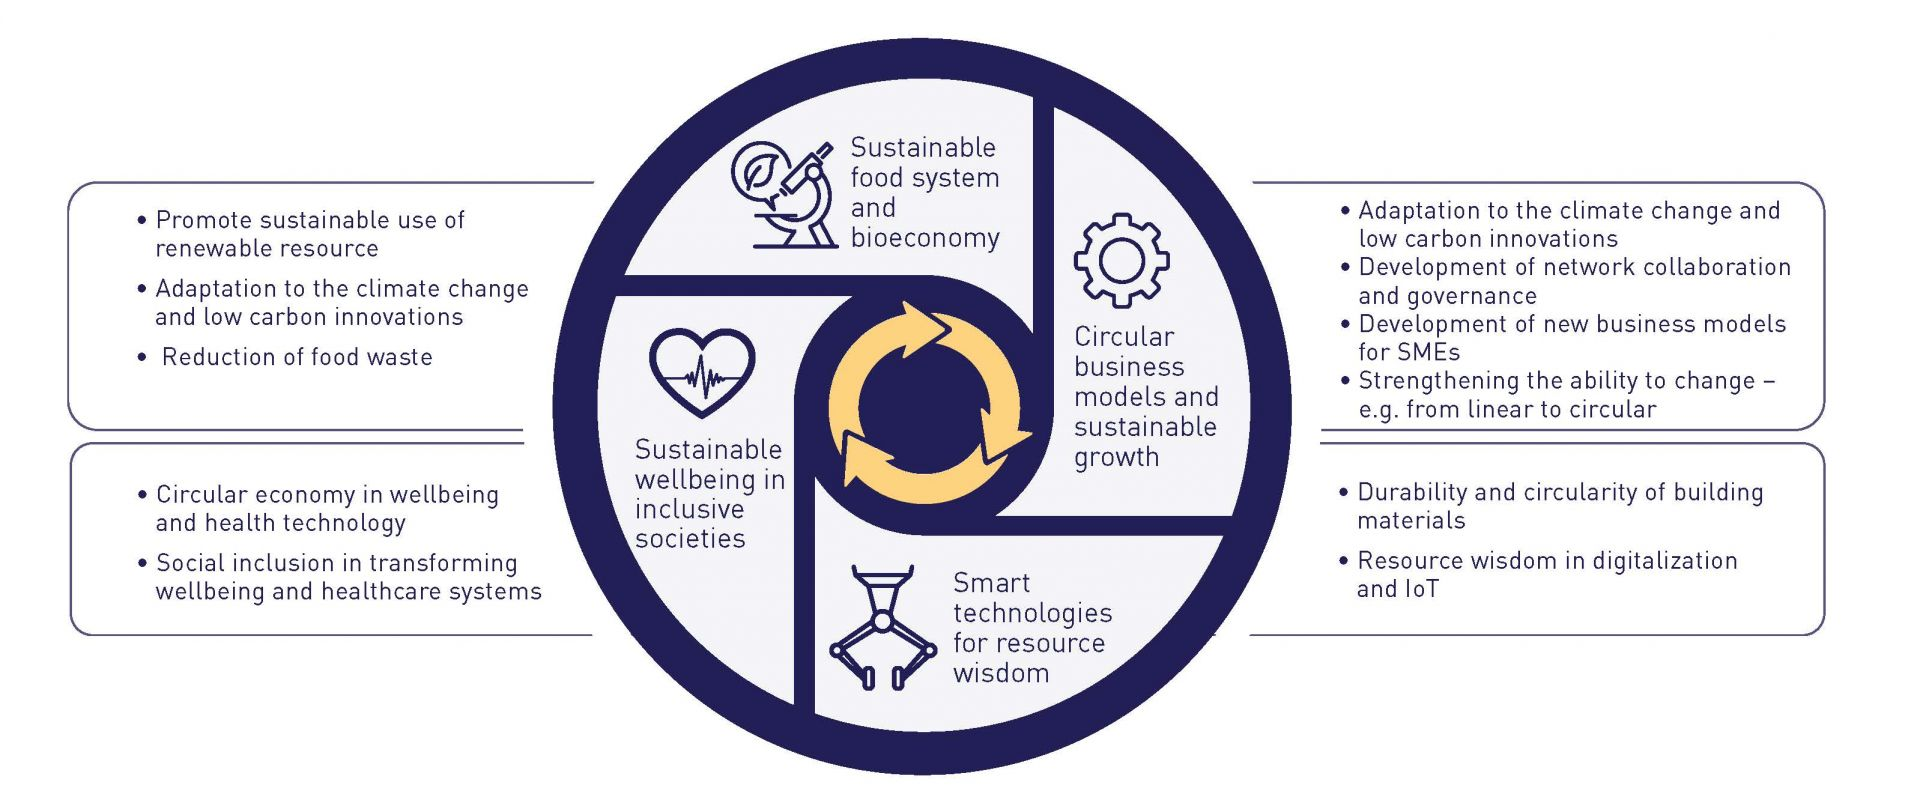 Circular Economy with Sustainability.